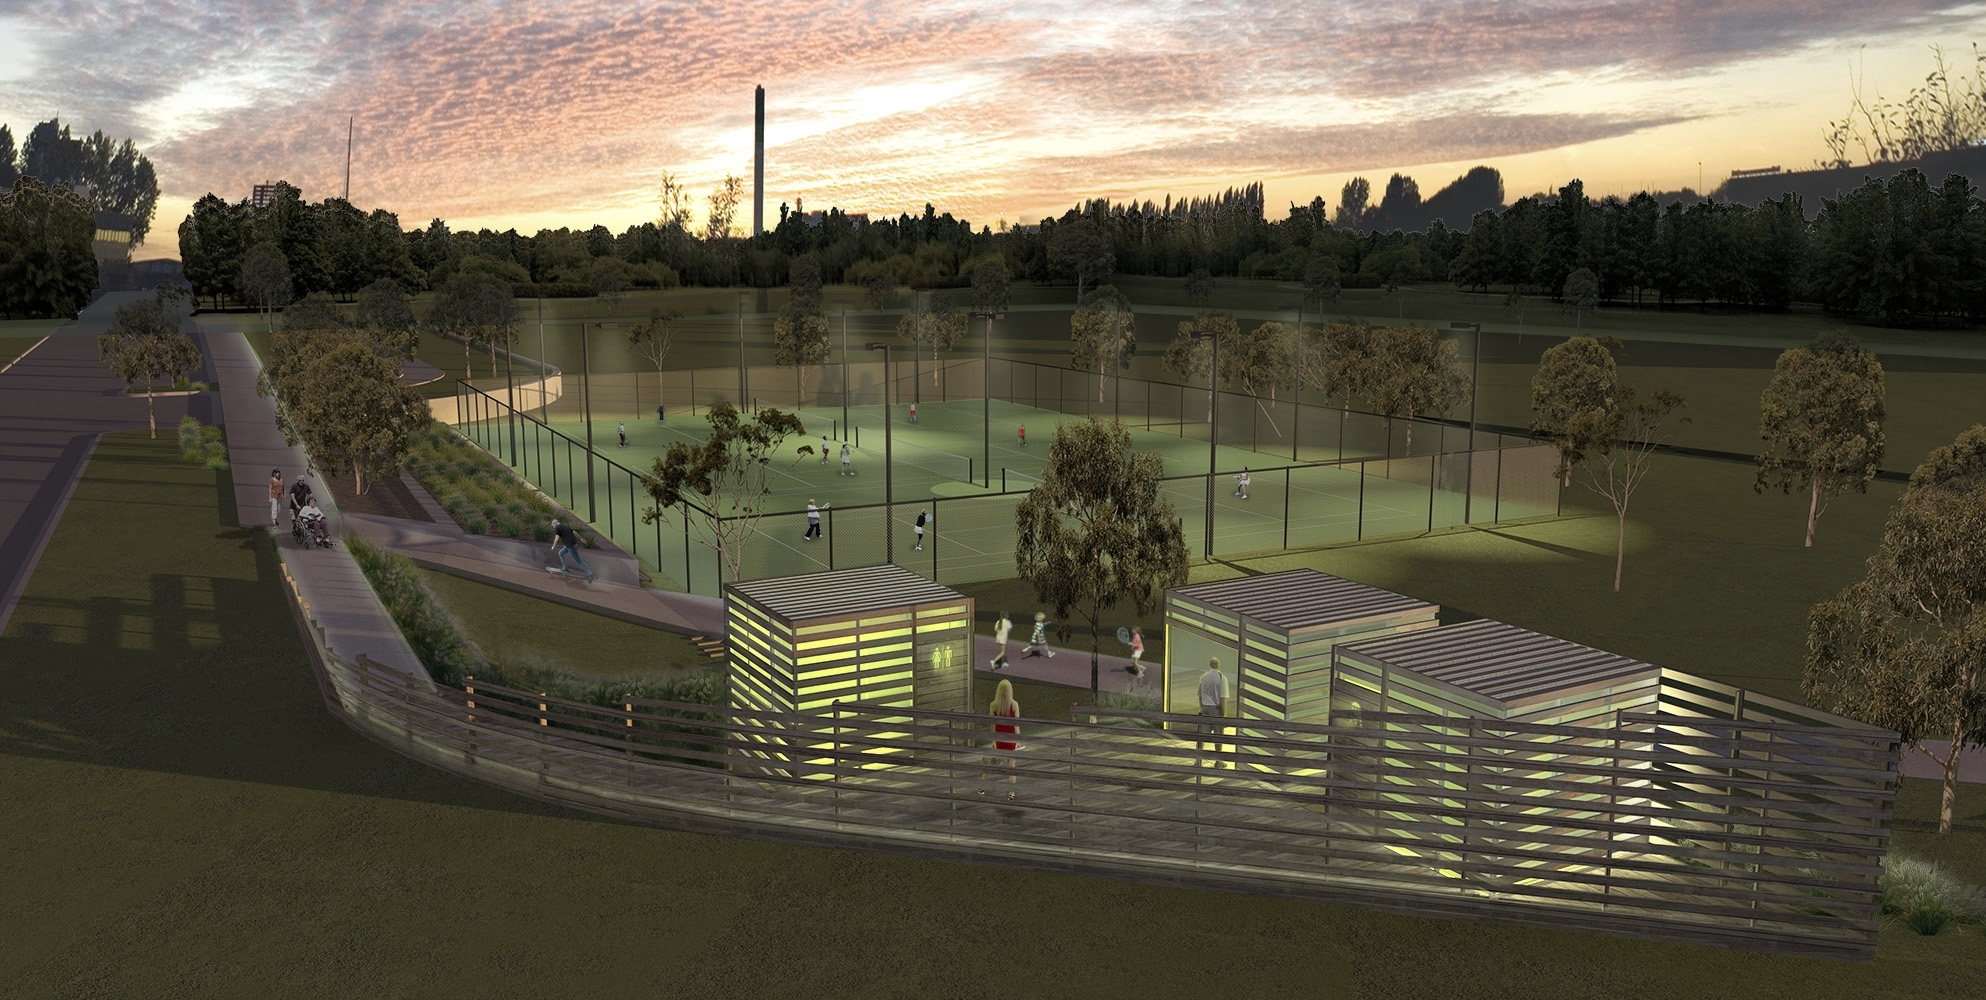 160321-Tennis-Render SML.jpg